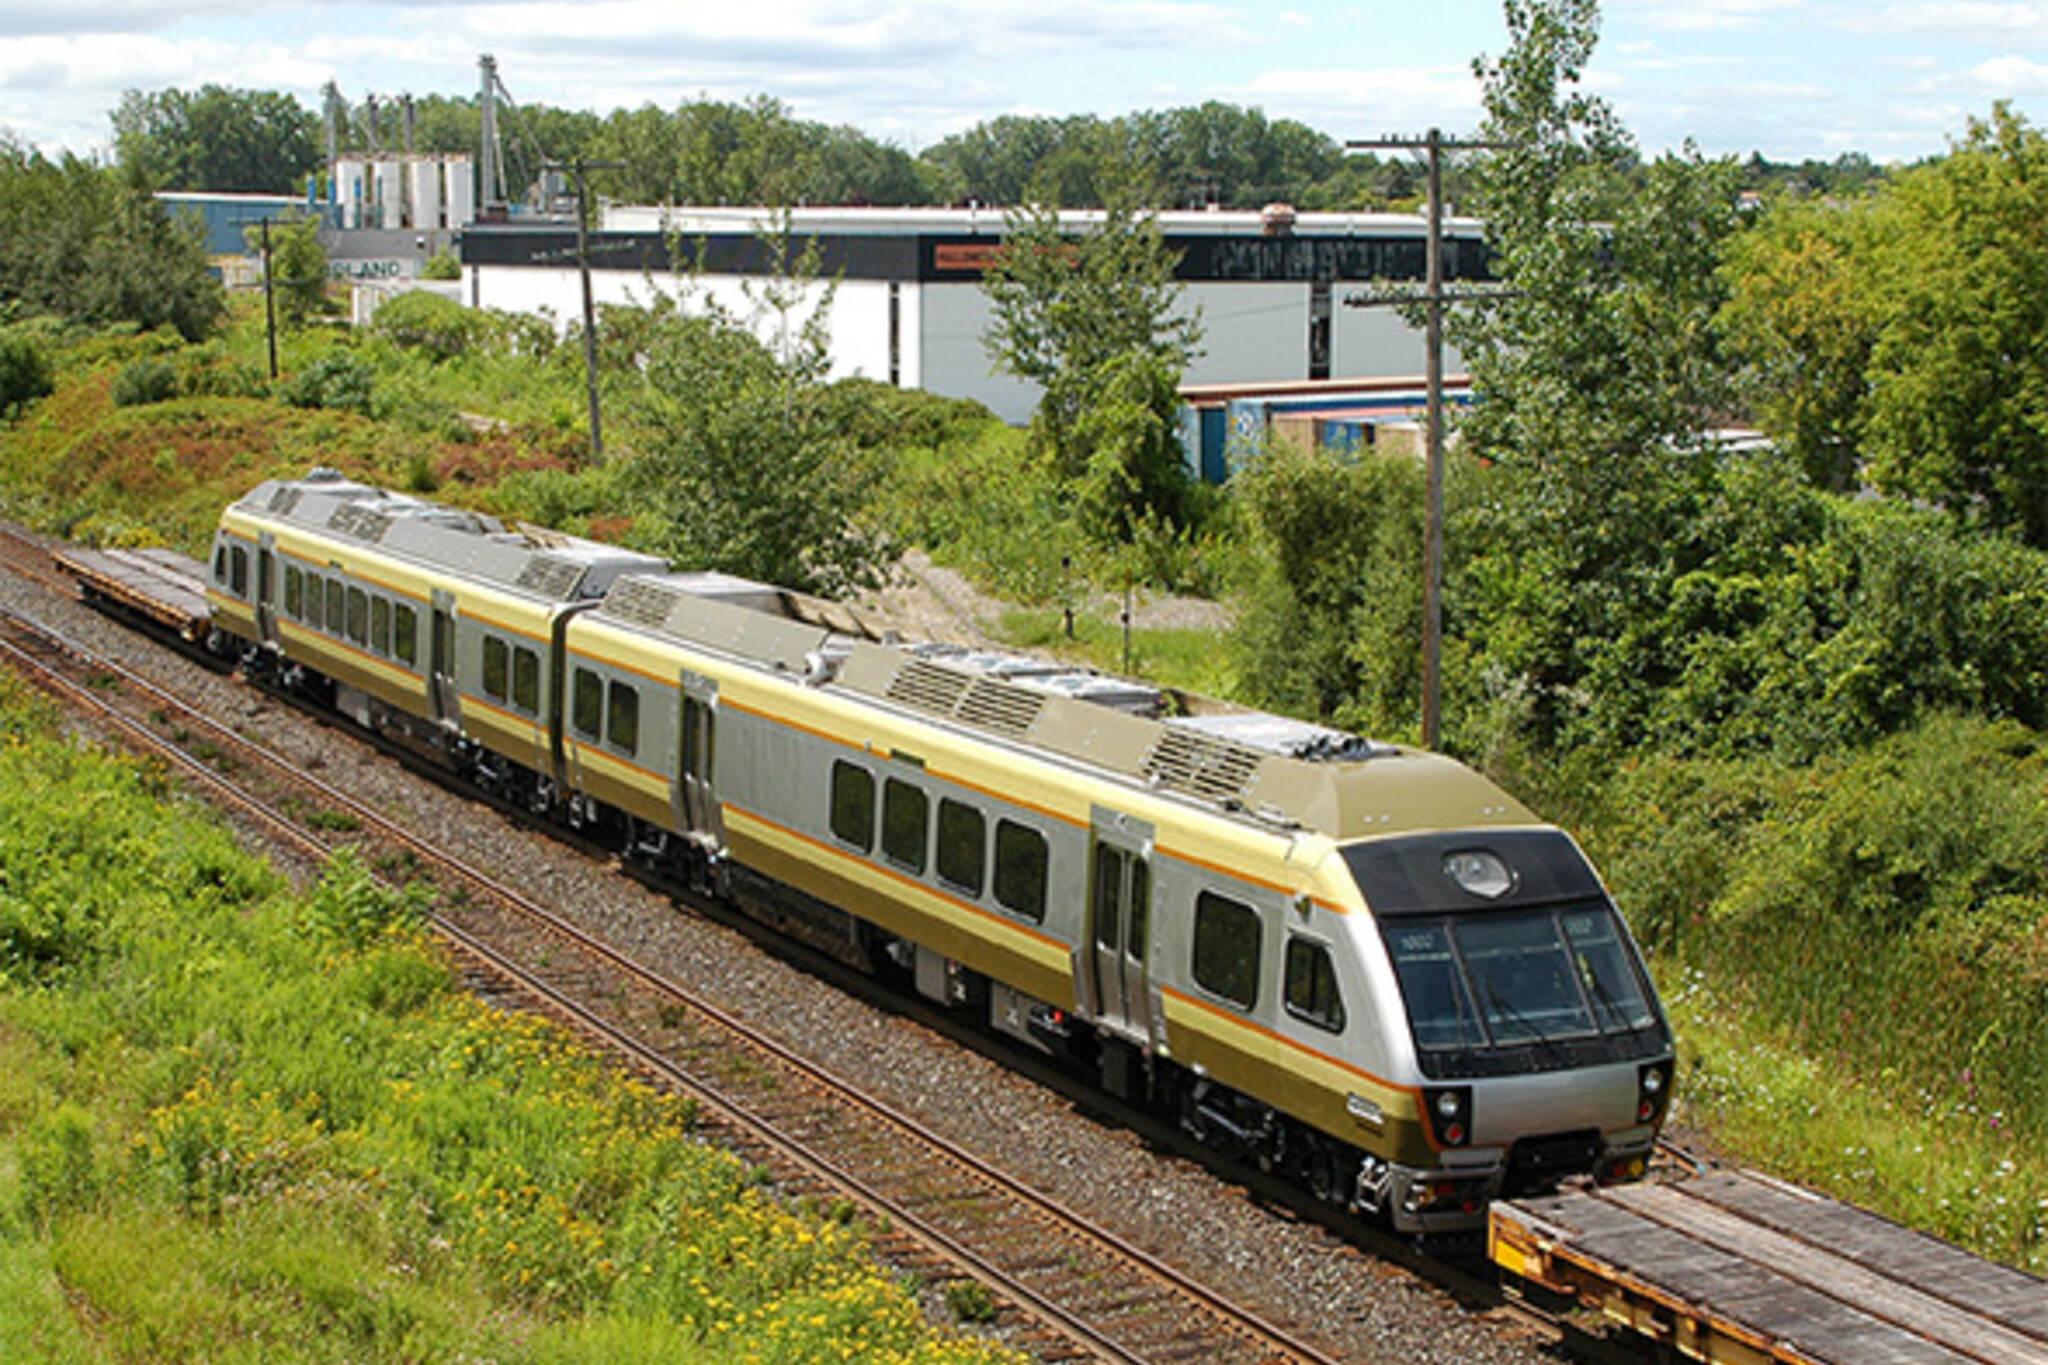 Union Pearson Express